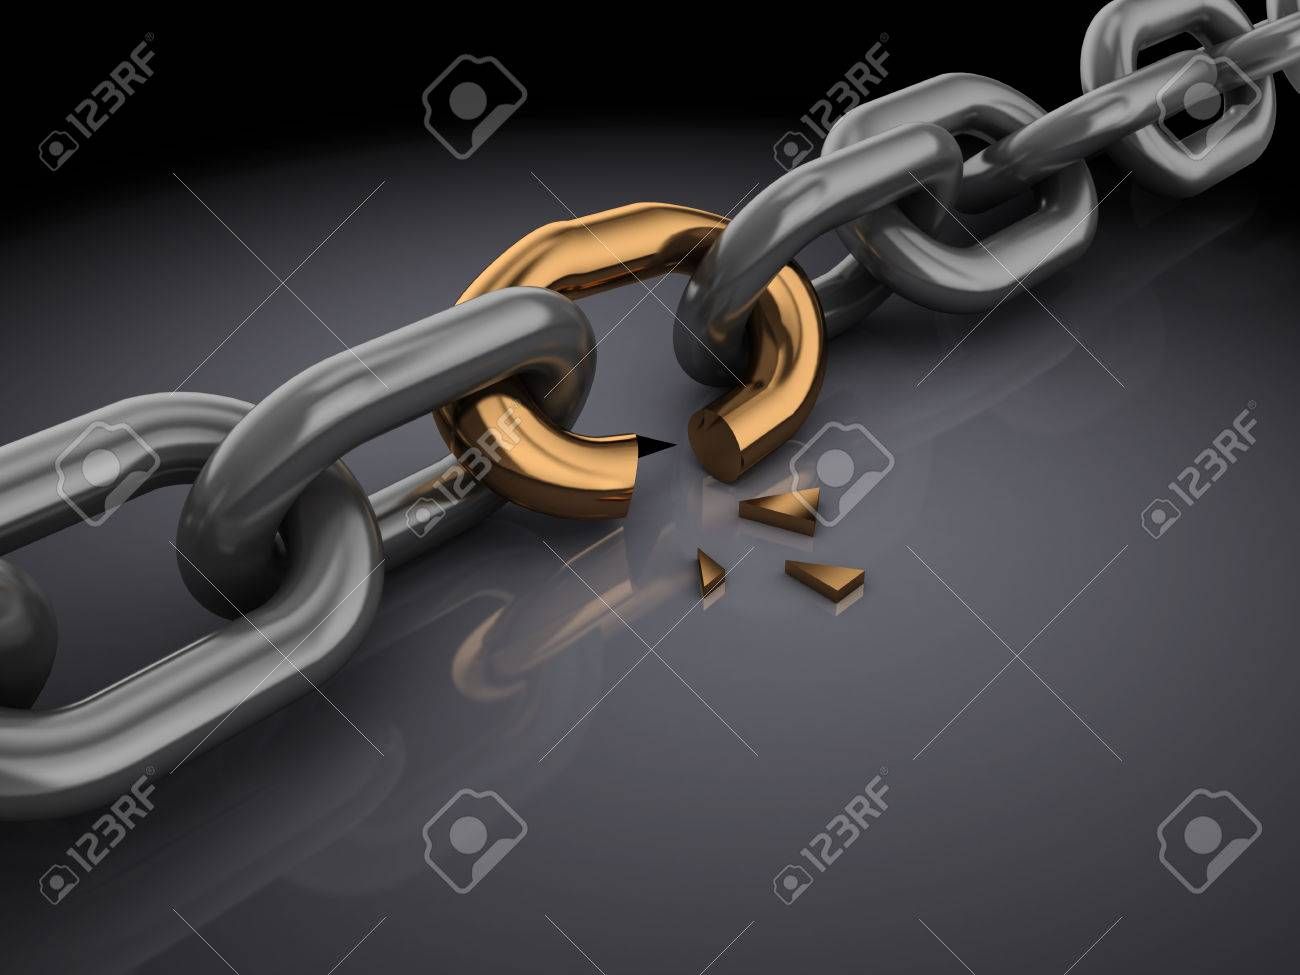 3d illustration of broken chain, over black background - 26820003